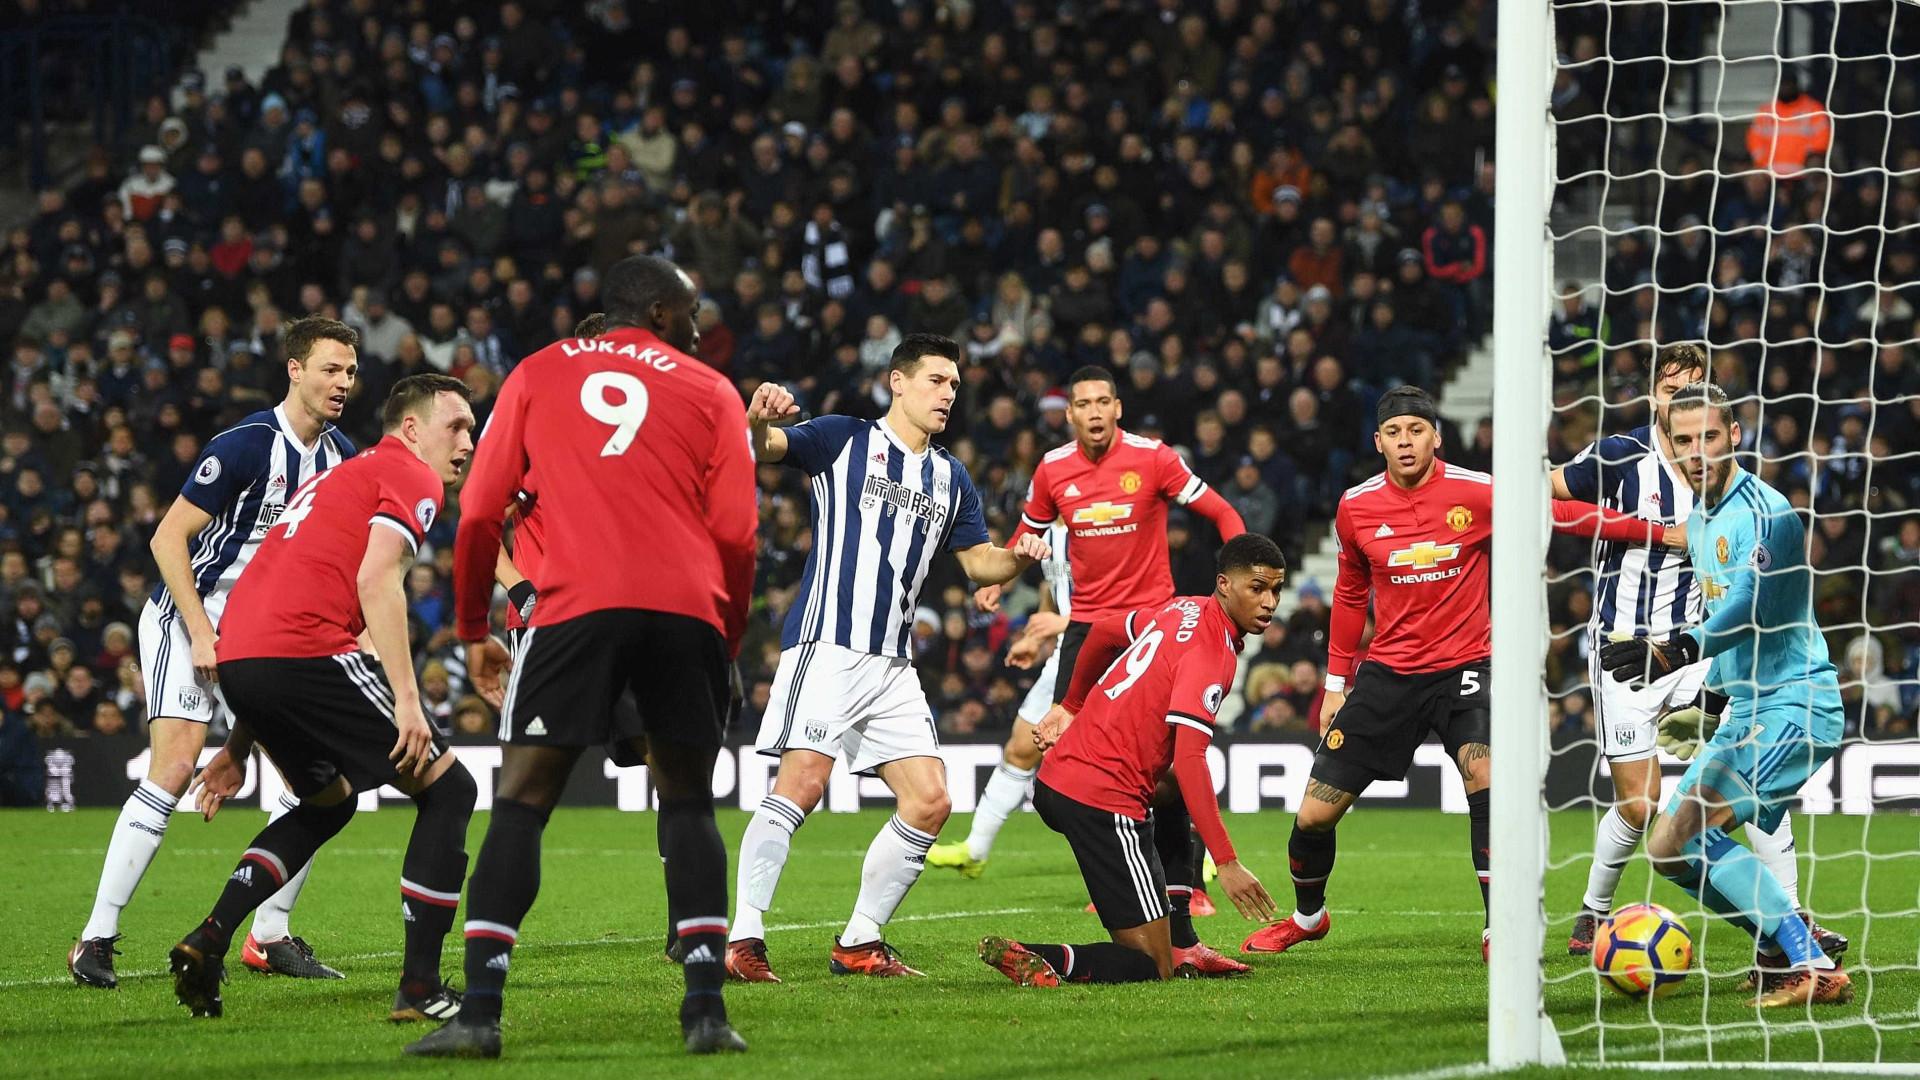 United vence na visita ao West Brom